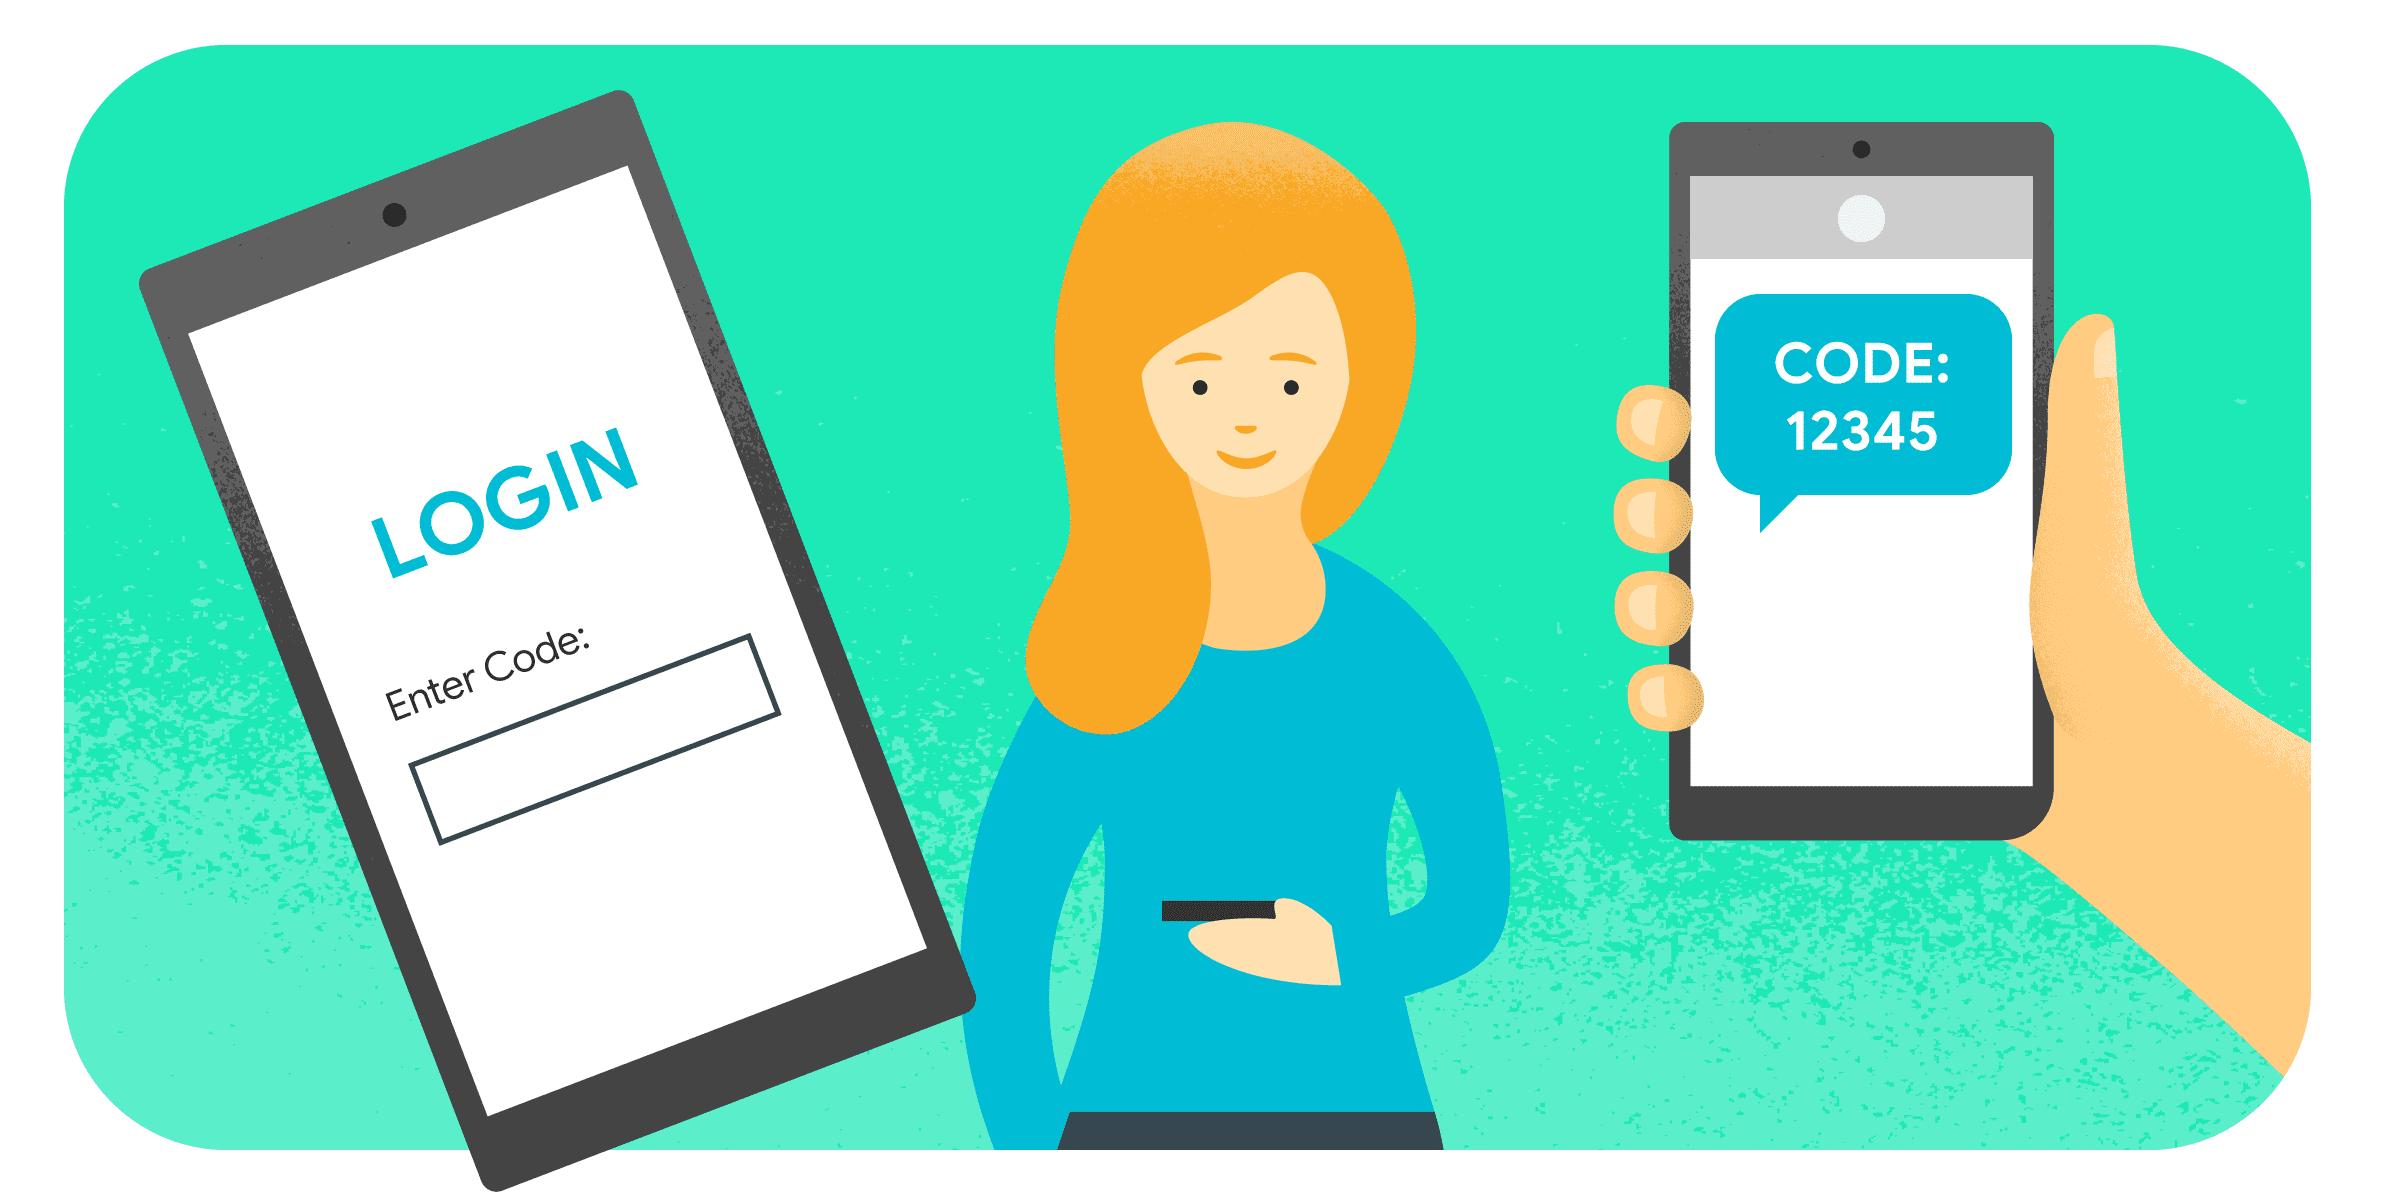 2FA - SMS OTP hoặc Voice OTP